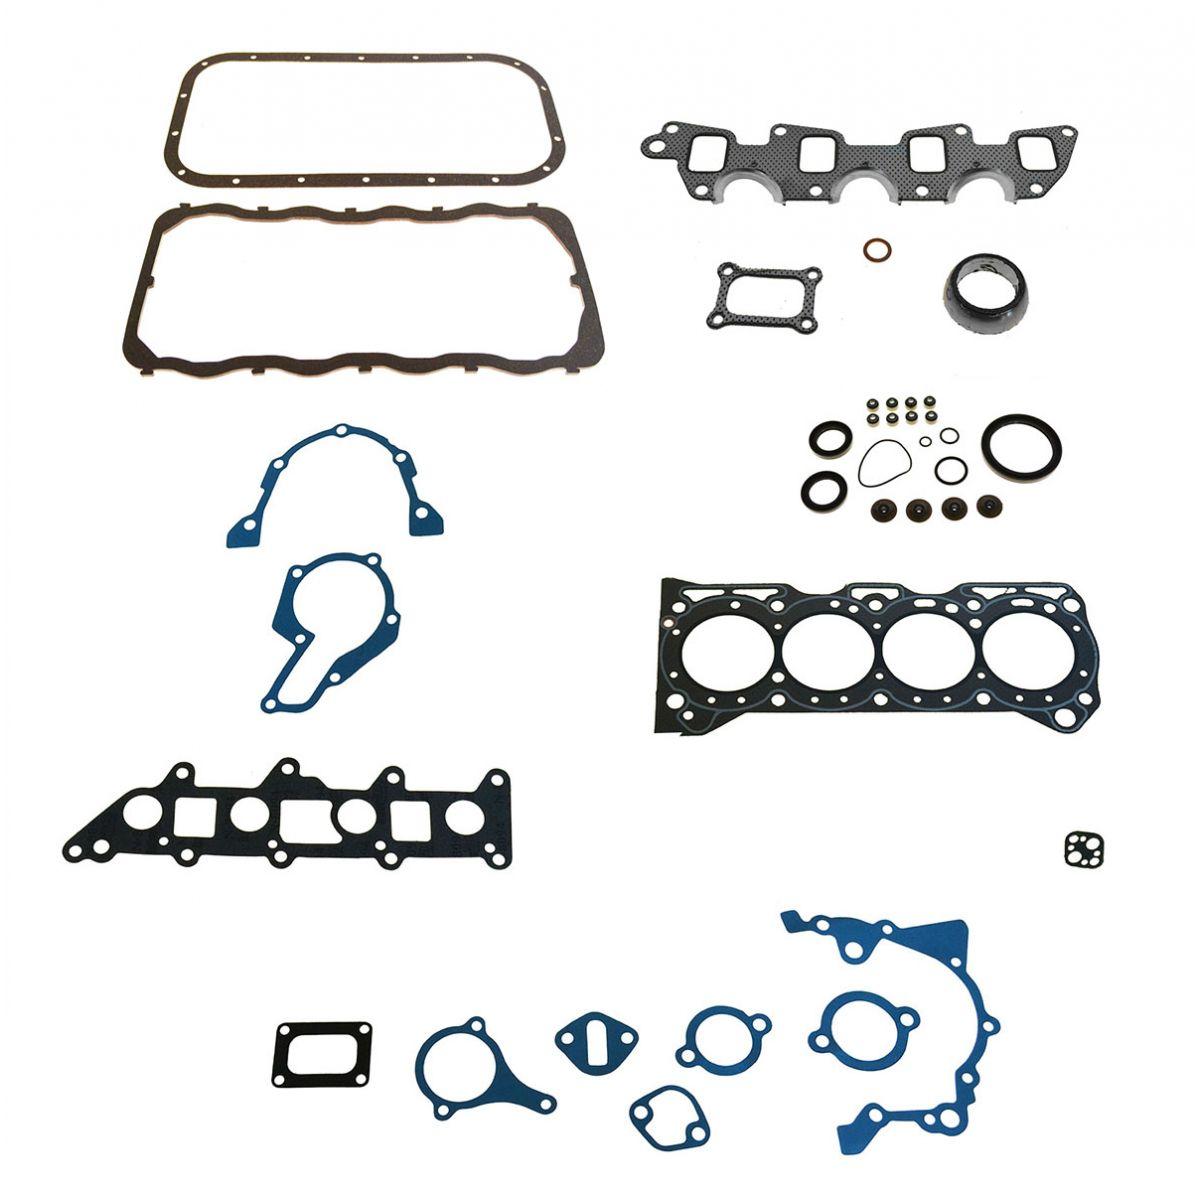 Complete Engine Gasket Set Kit For Suzuki Sidekick Swift Samurai 13 1990 13l